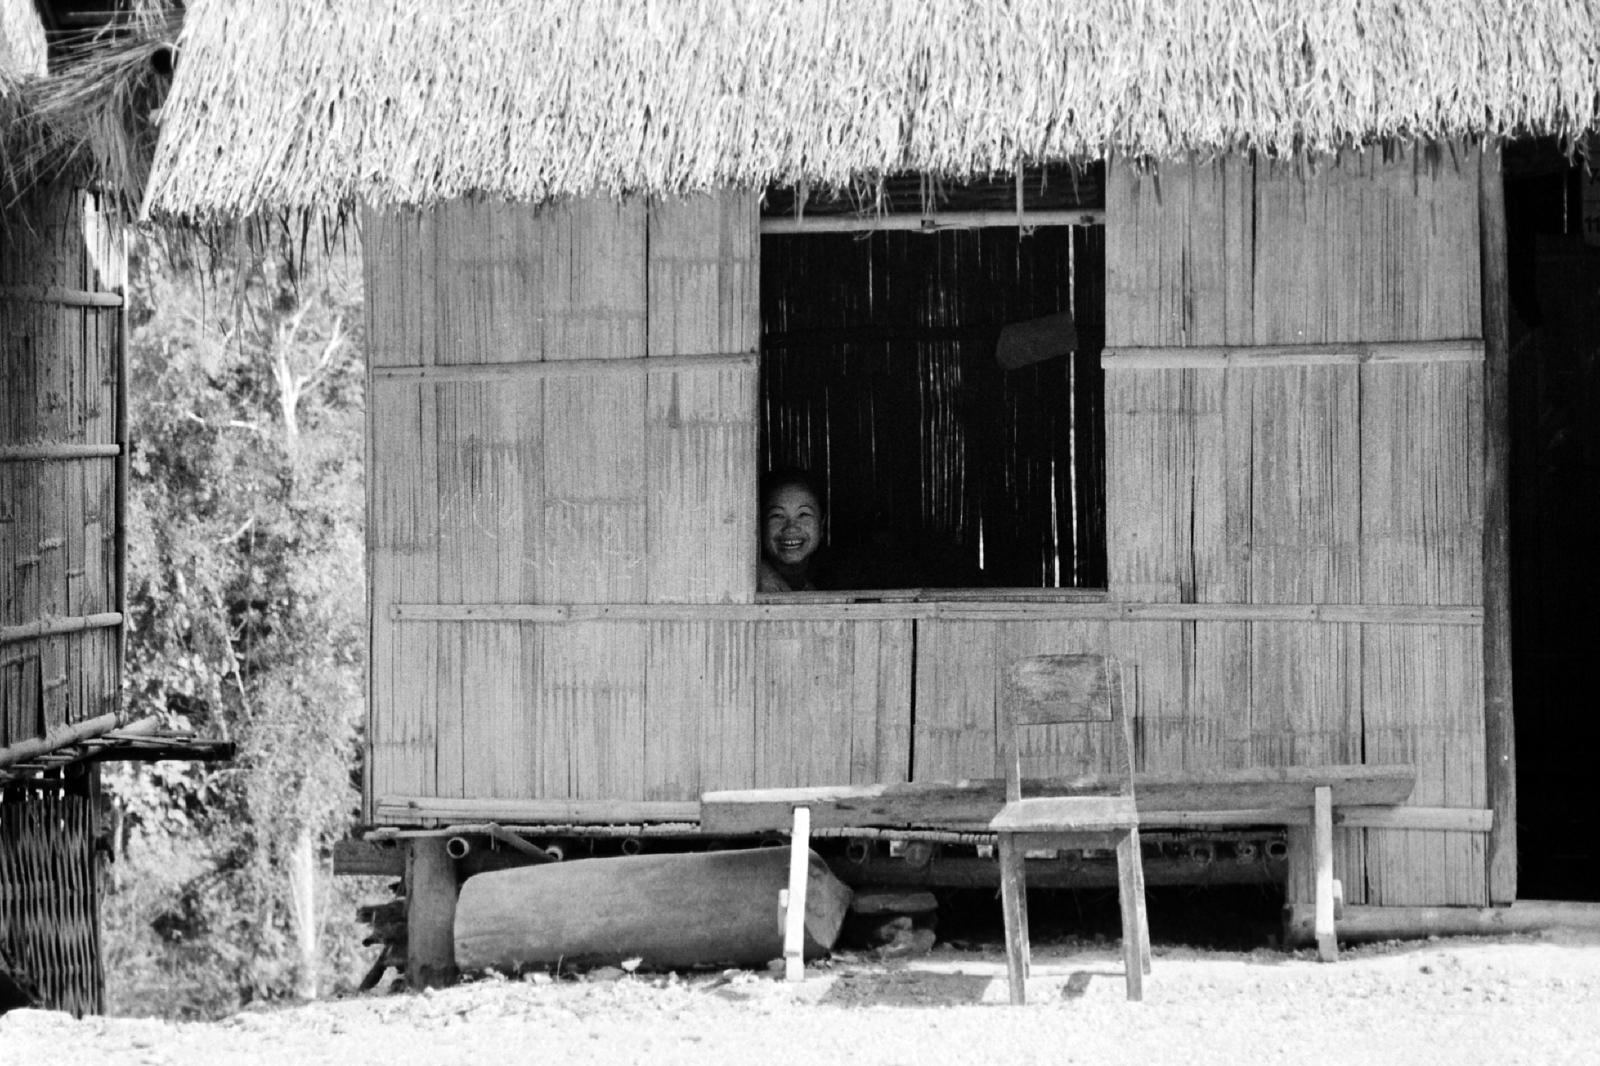 laos -smiley girl in window